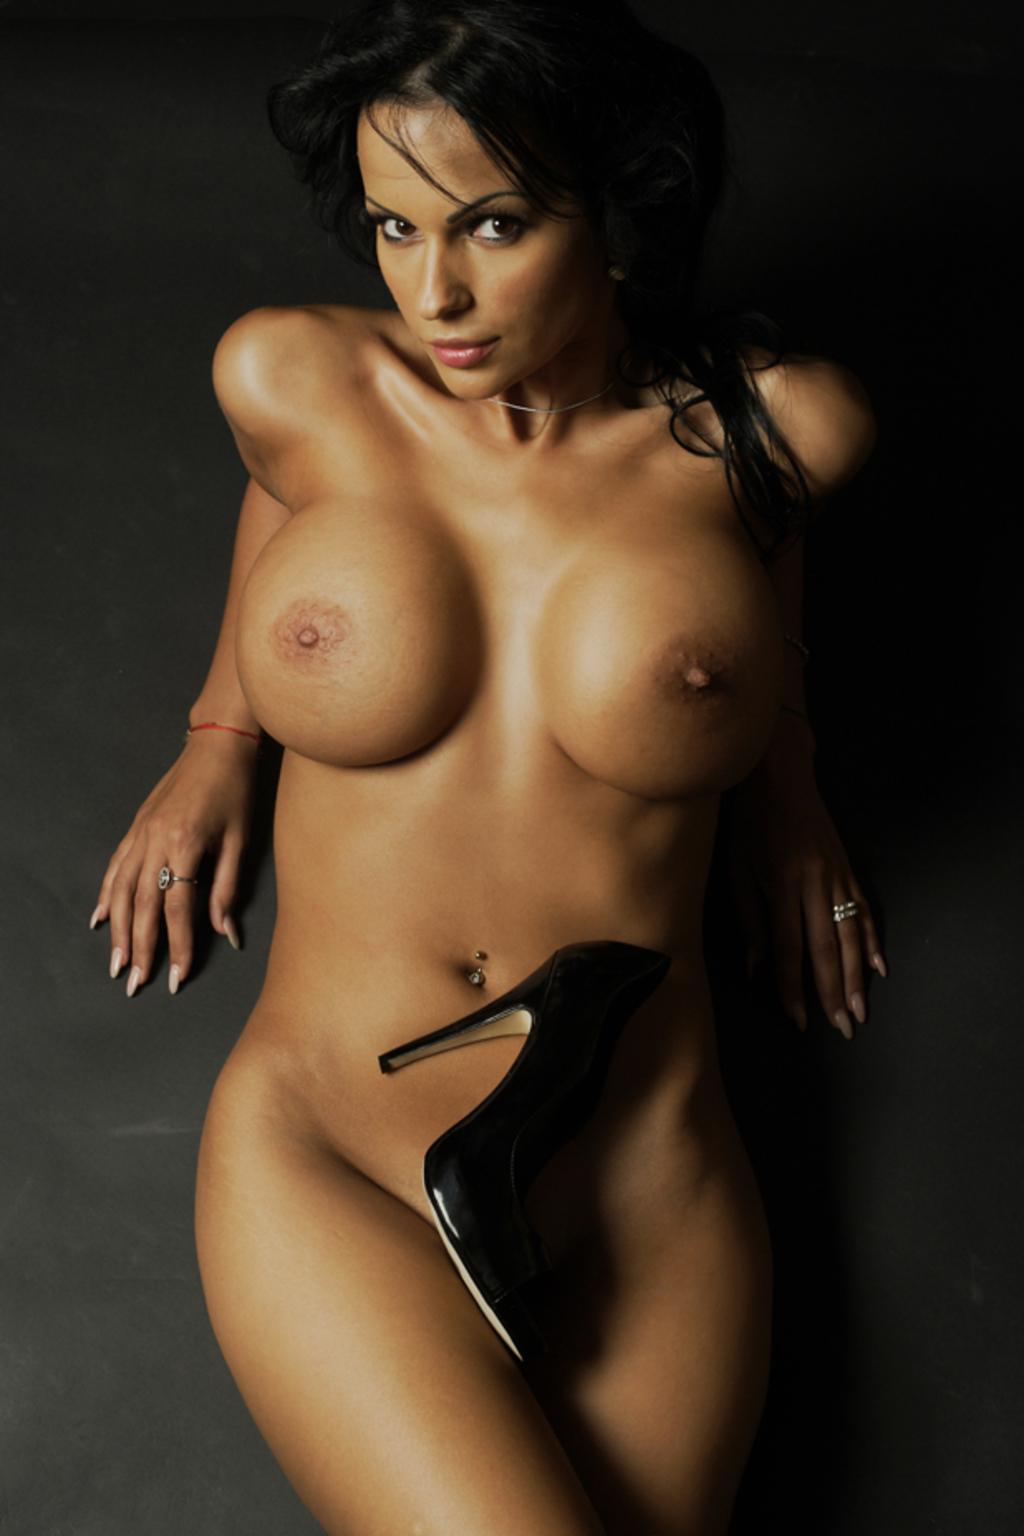 nude women outdoors sex